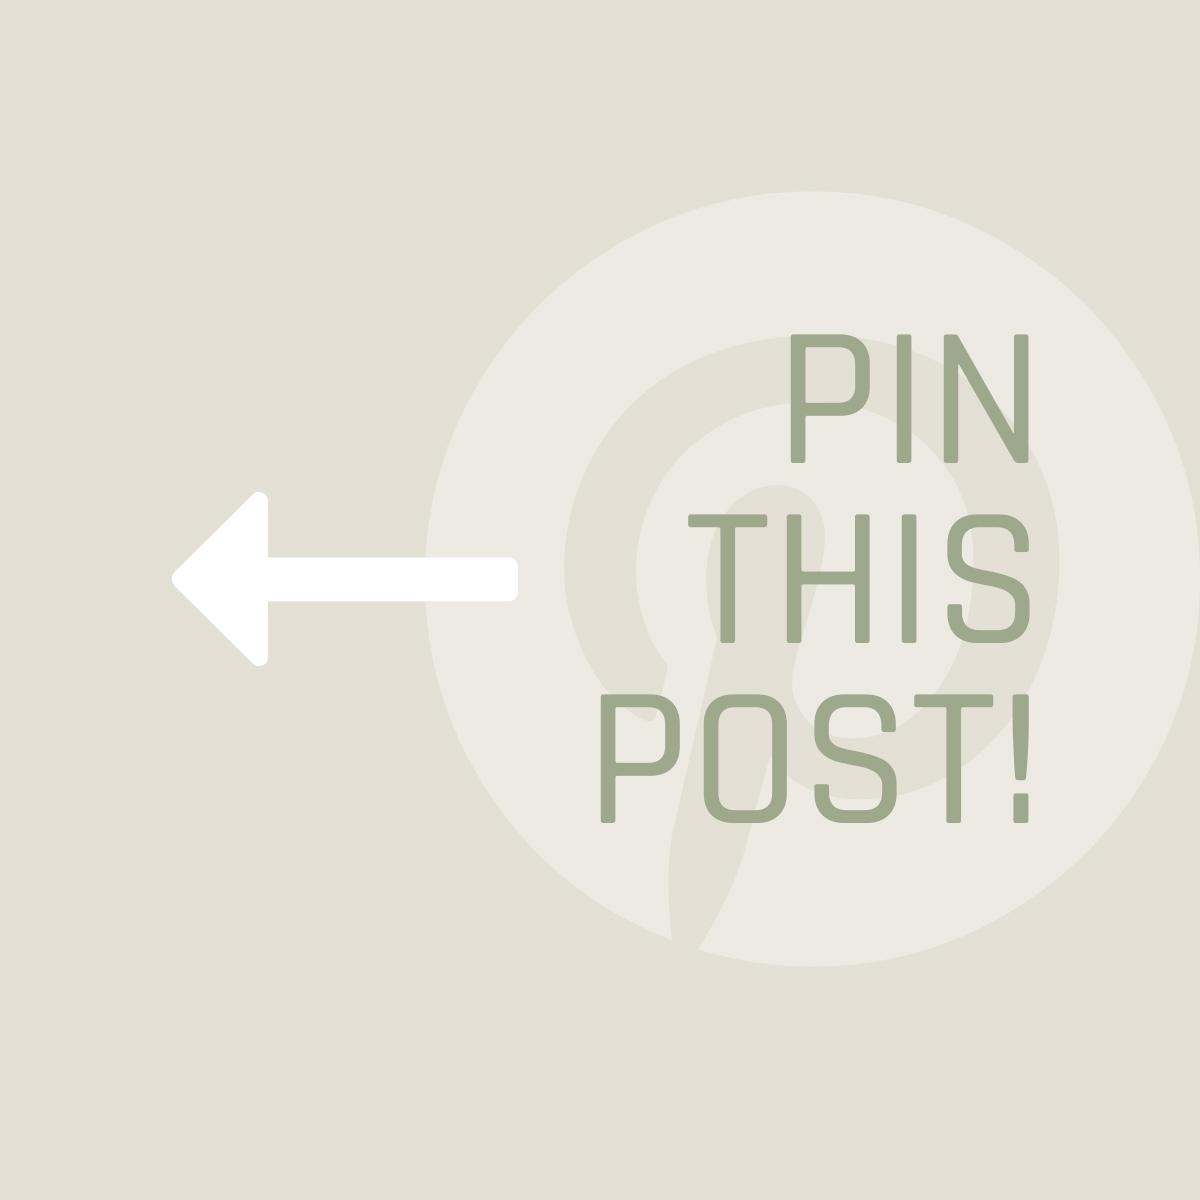 Nowhere & Everywhere Pinterest Pin this Post